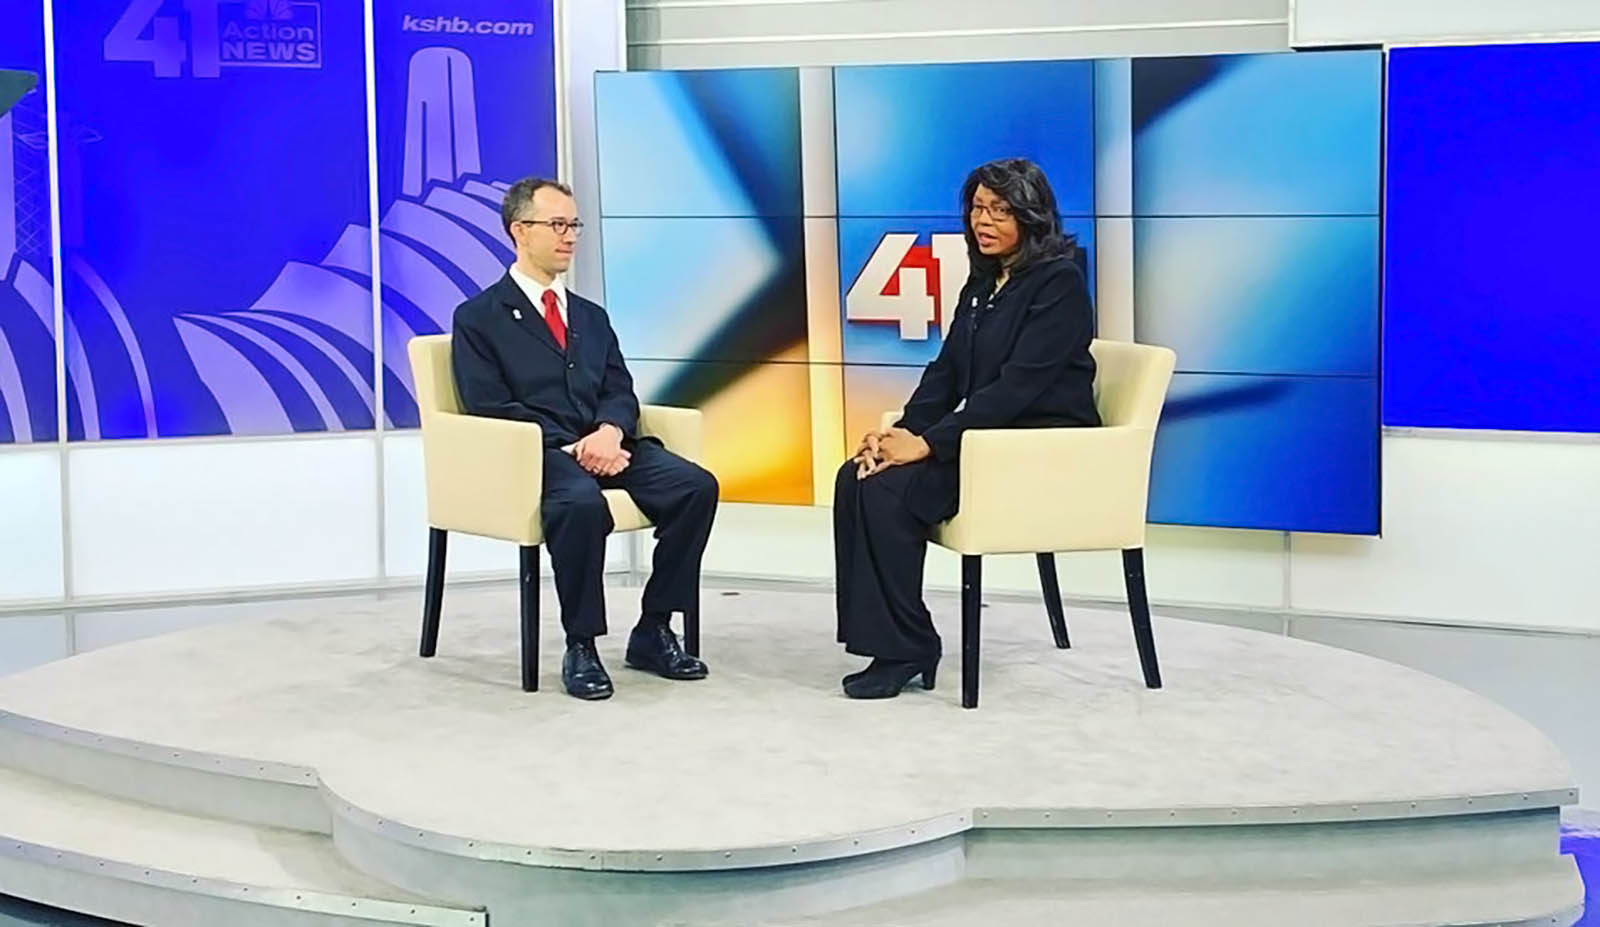 Cynthia Newsome interviewing at KSHB 41 News studio